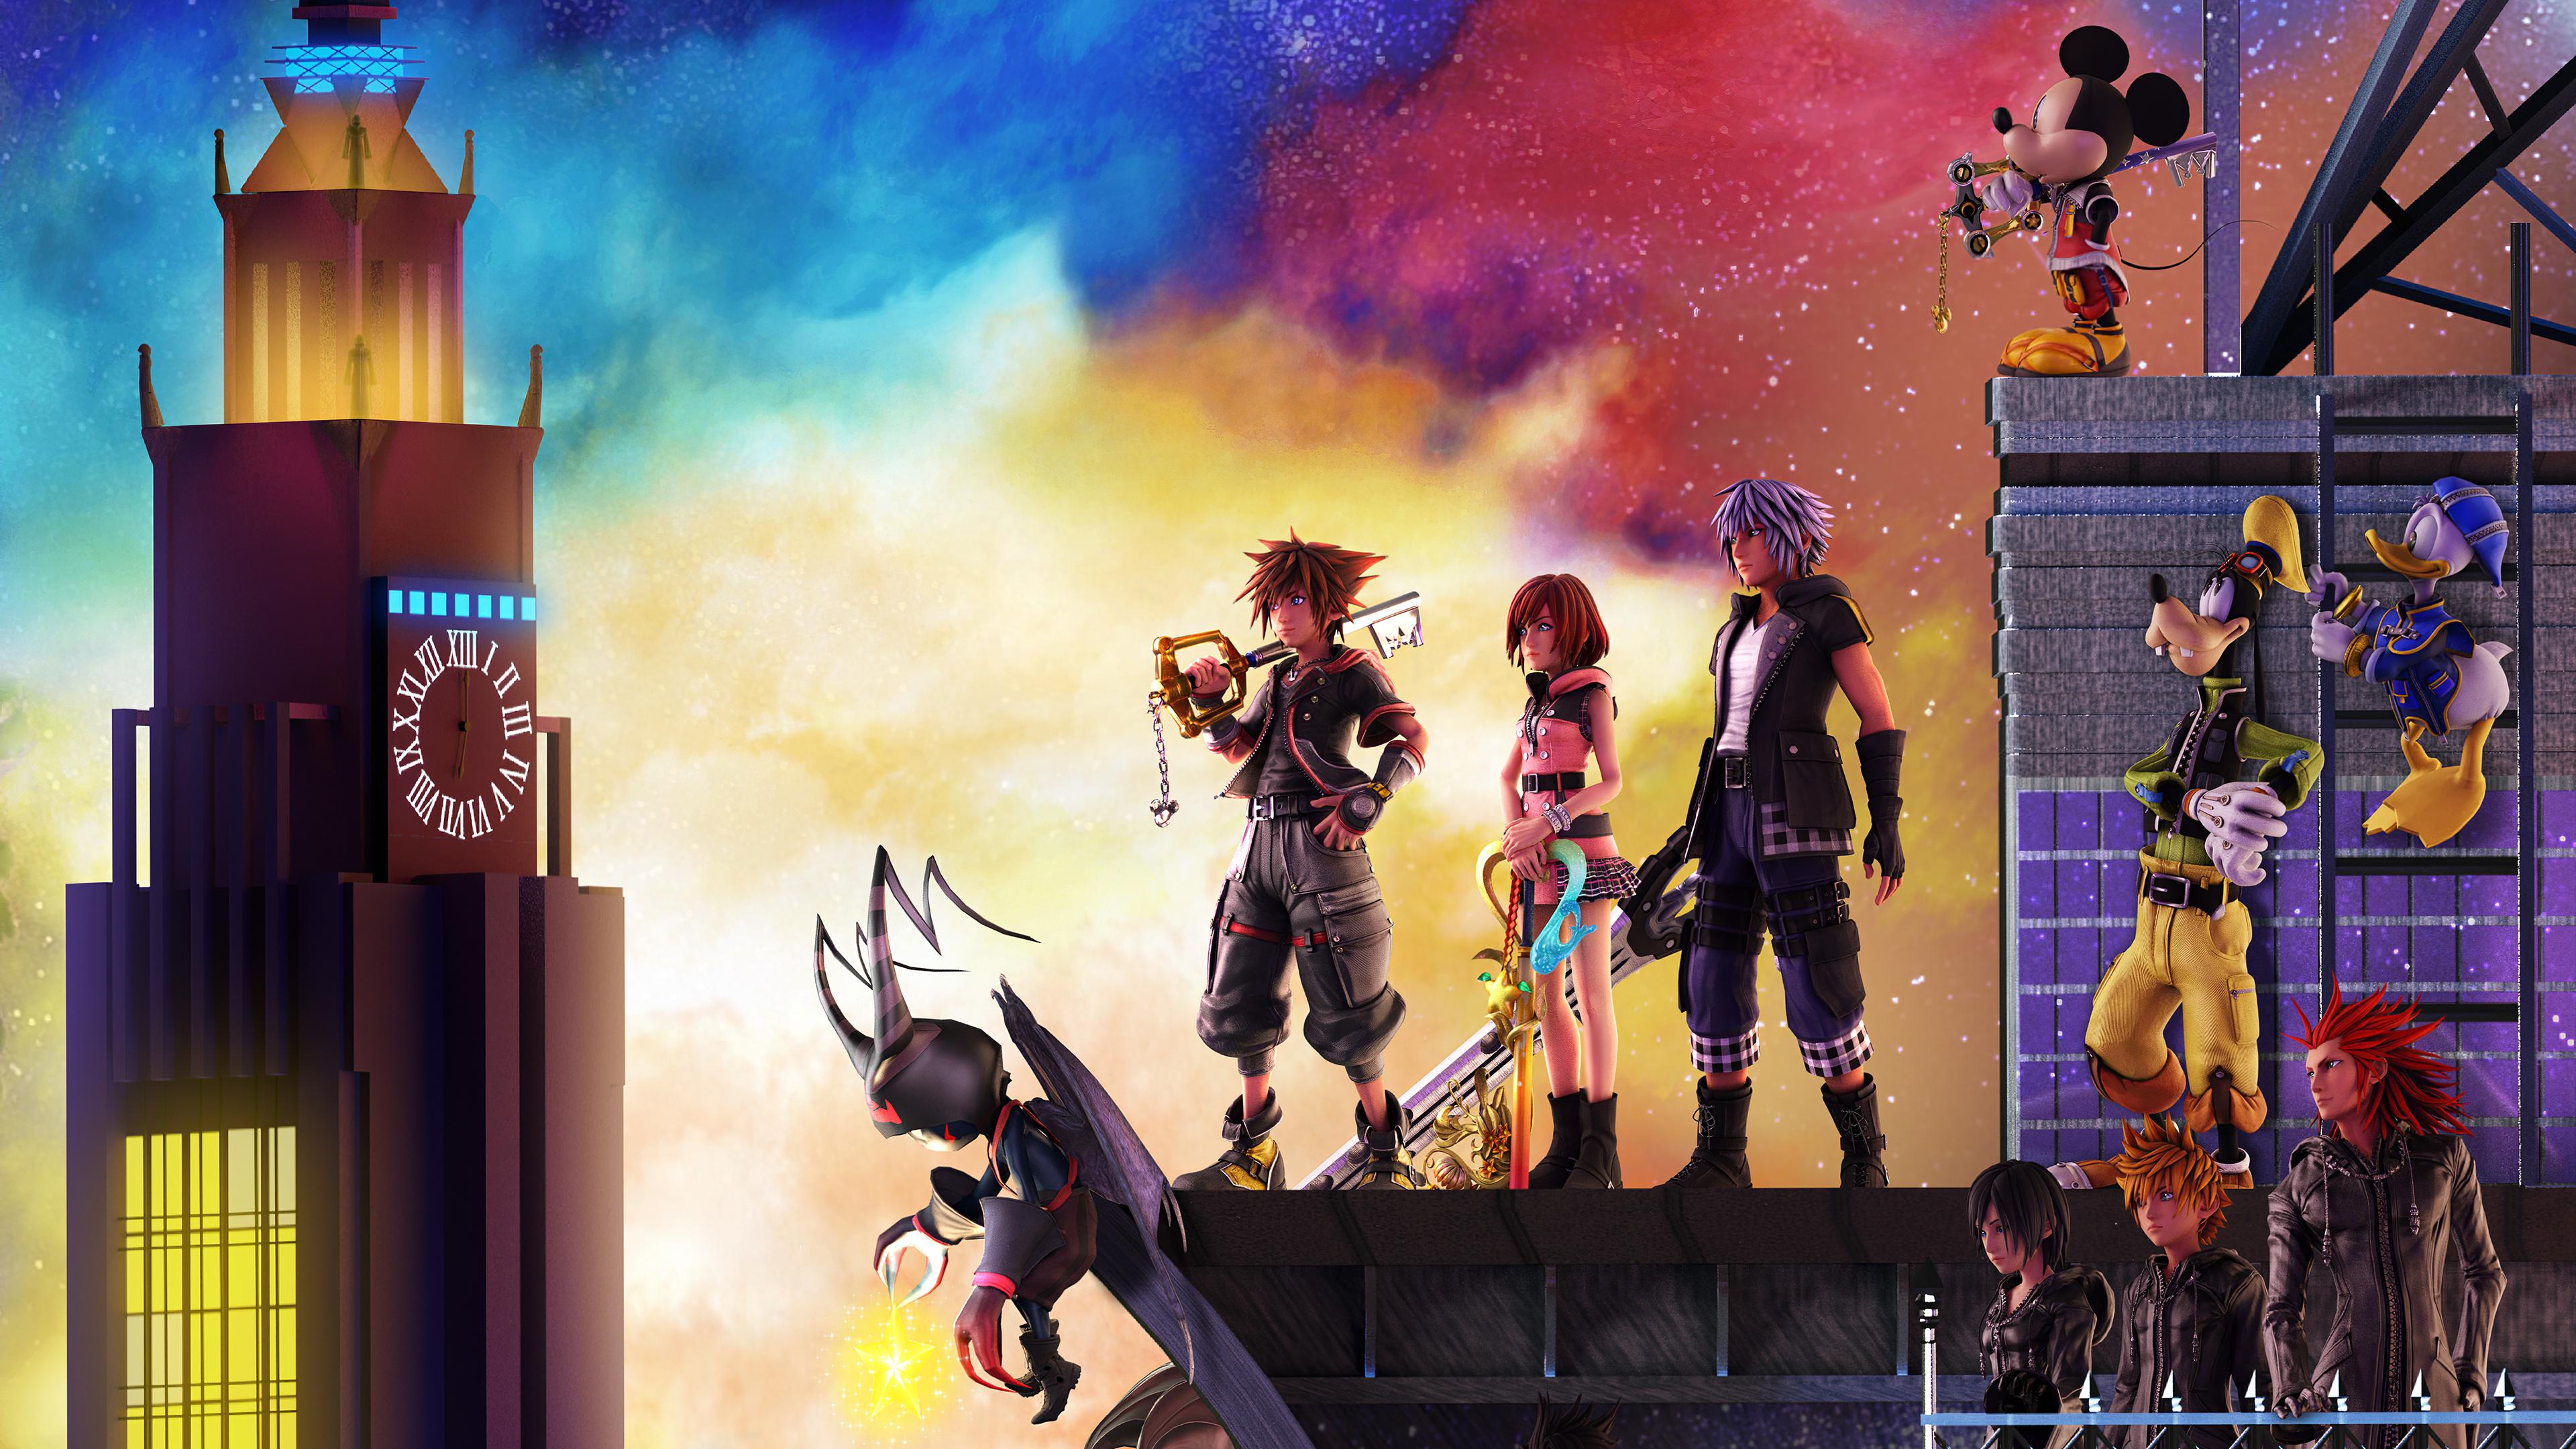 Kingdom Hearts 3 Wallpaper, HD Games 4K Wallpapers, Images ...